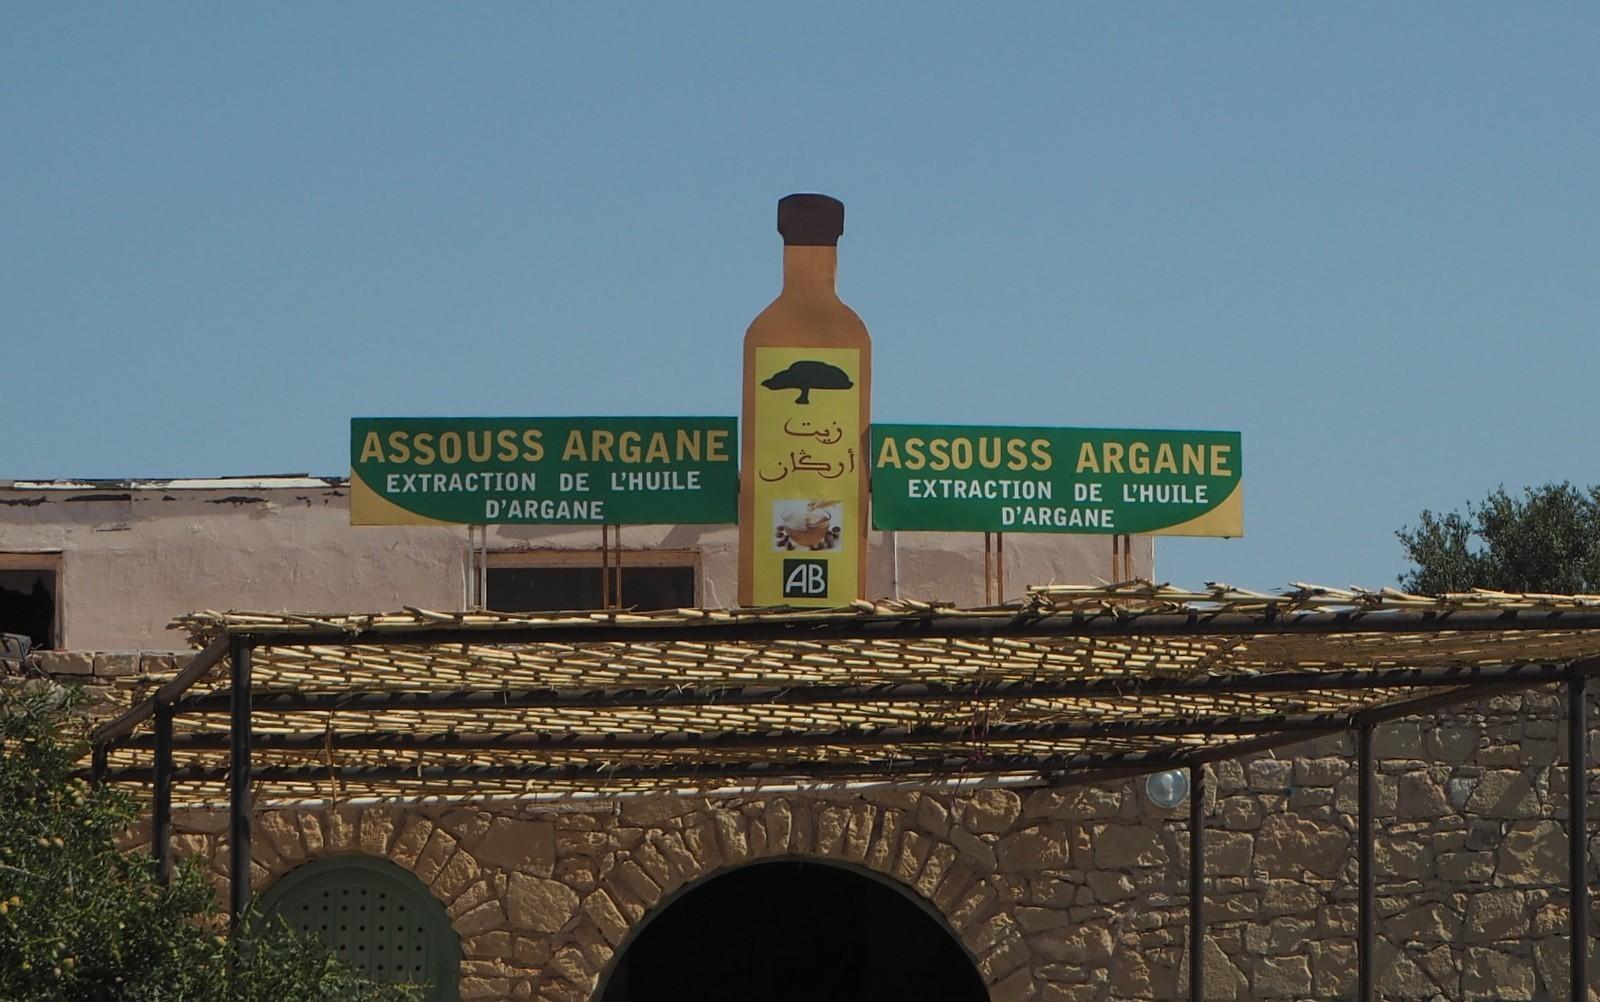 Argan öljy Essaouira